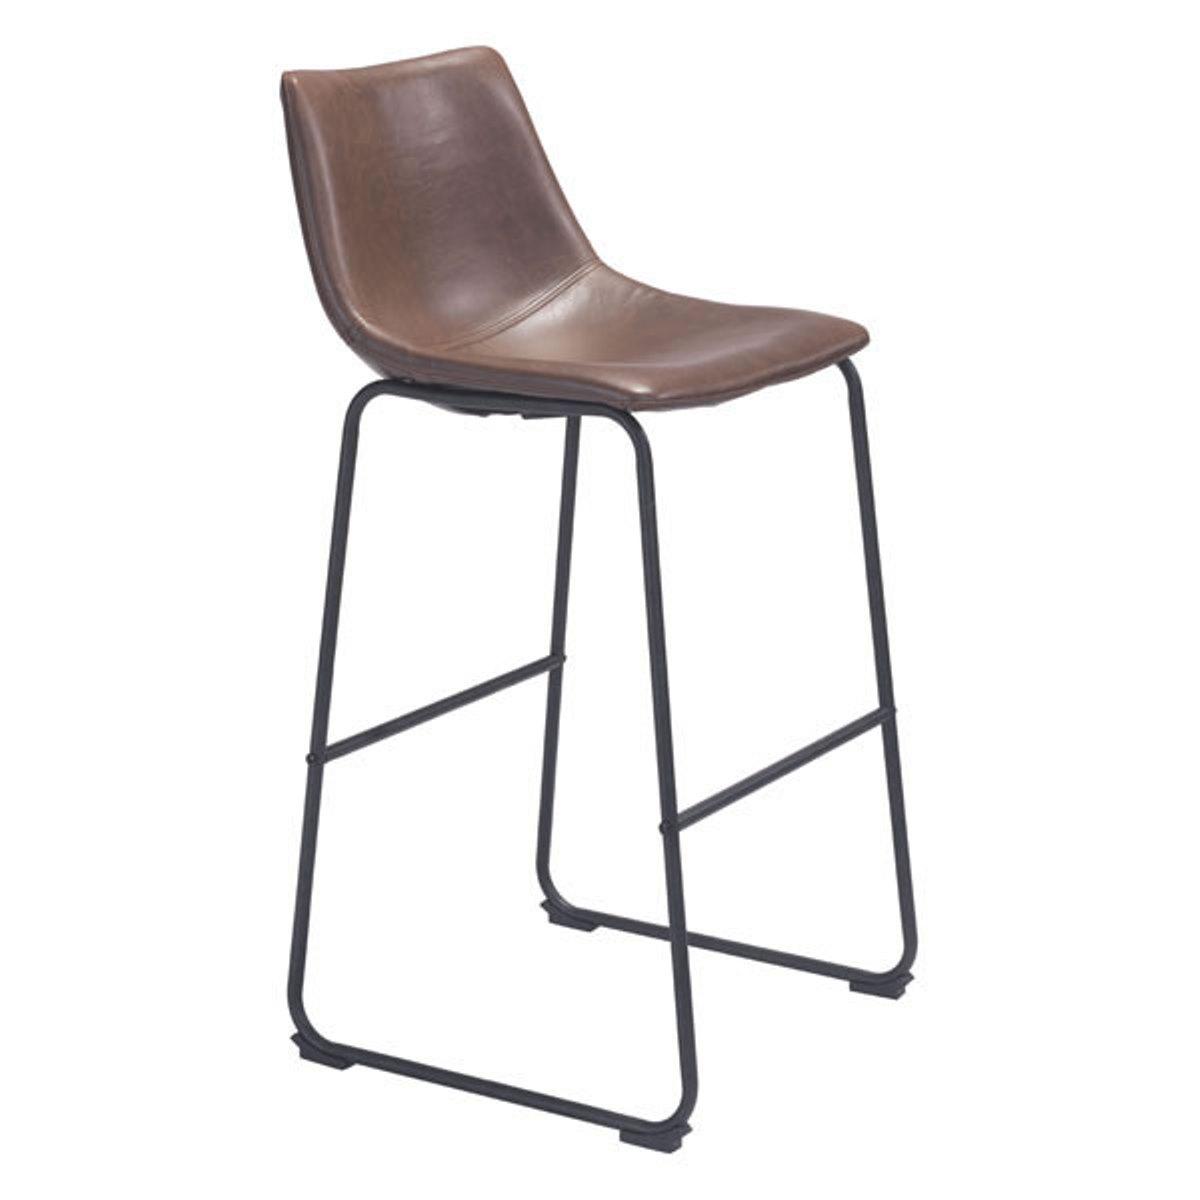 Bar Chair Vintage Espresso - Leatherette Plywood, Metal